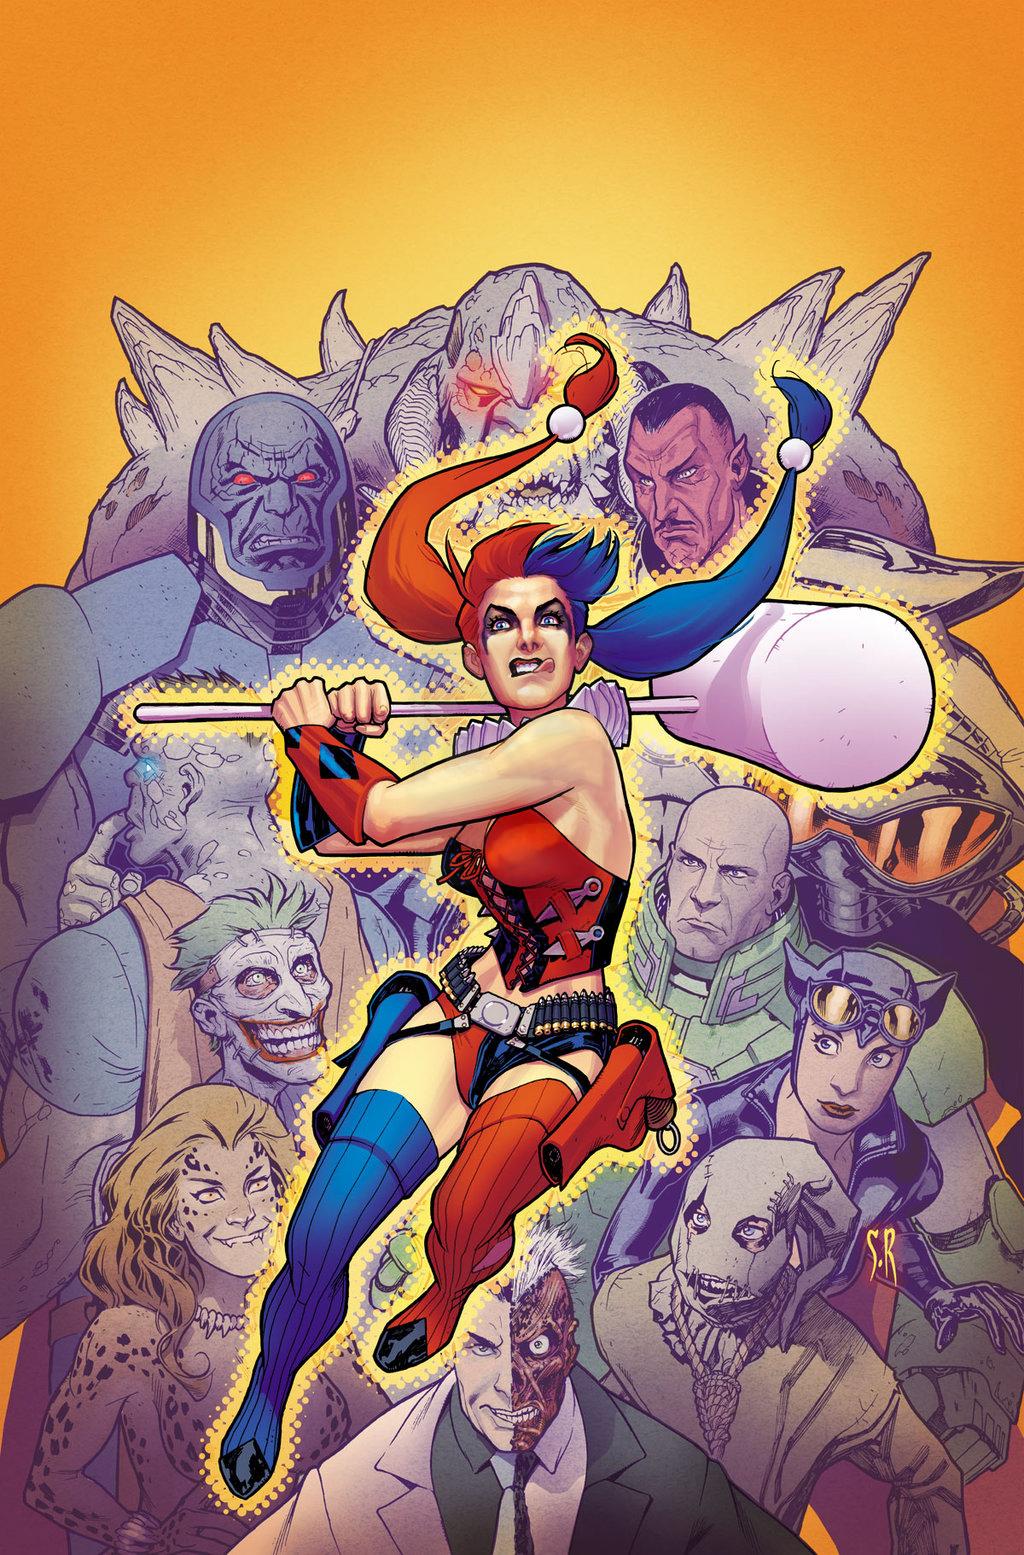 Harley Quinn Vol 2 0 Textless Variant.jpg